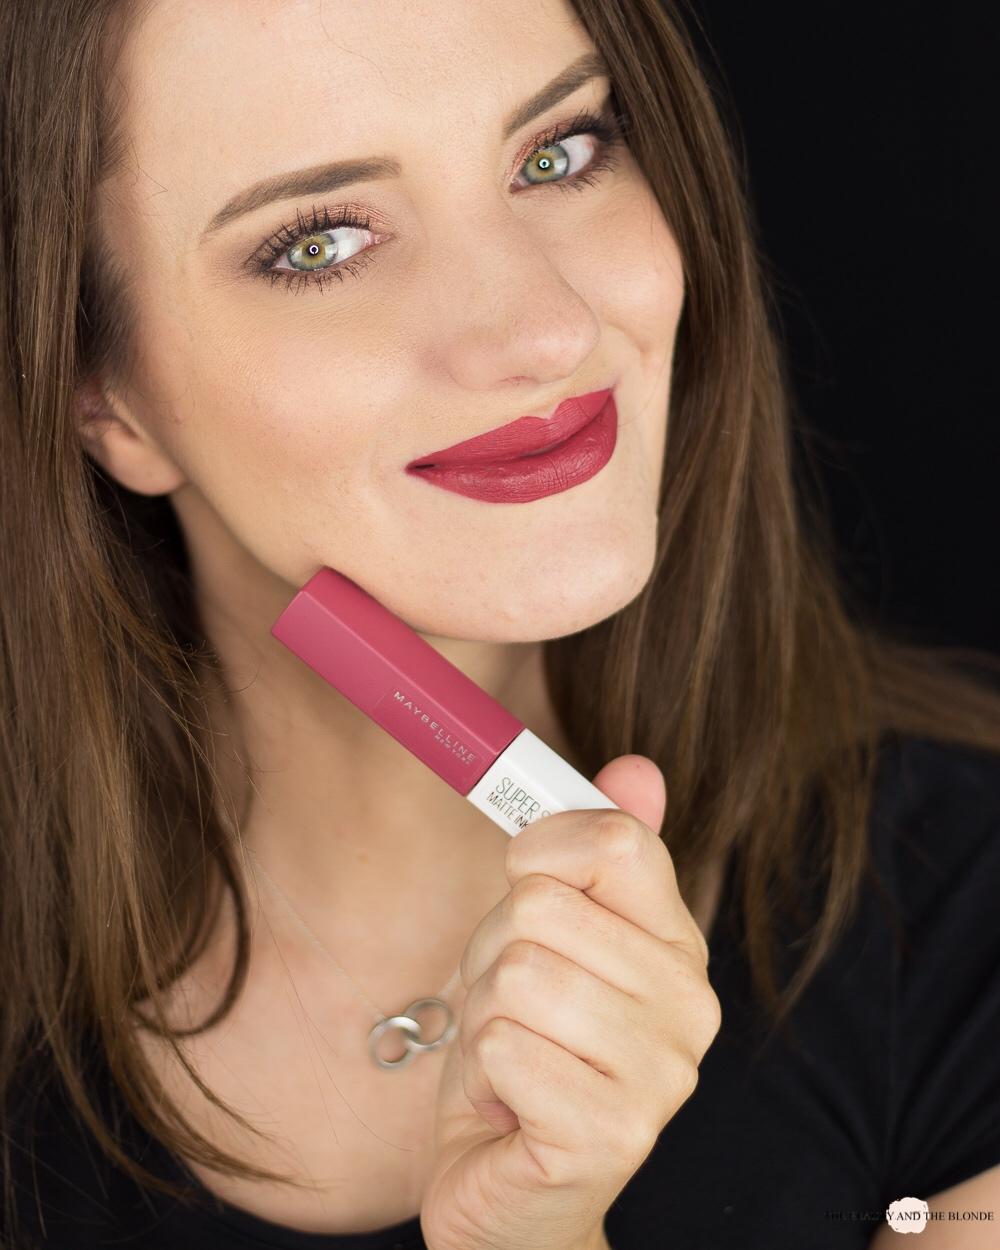 Maybelline Super Stay Matte Ink Ruler Tragebild Lipswatch Review